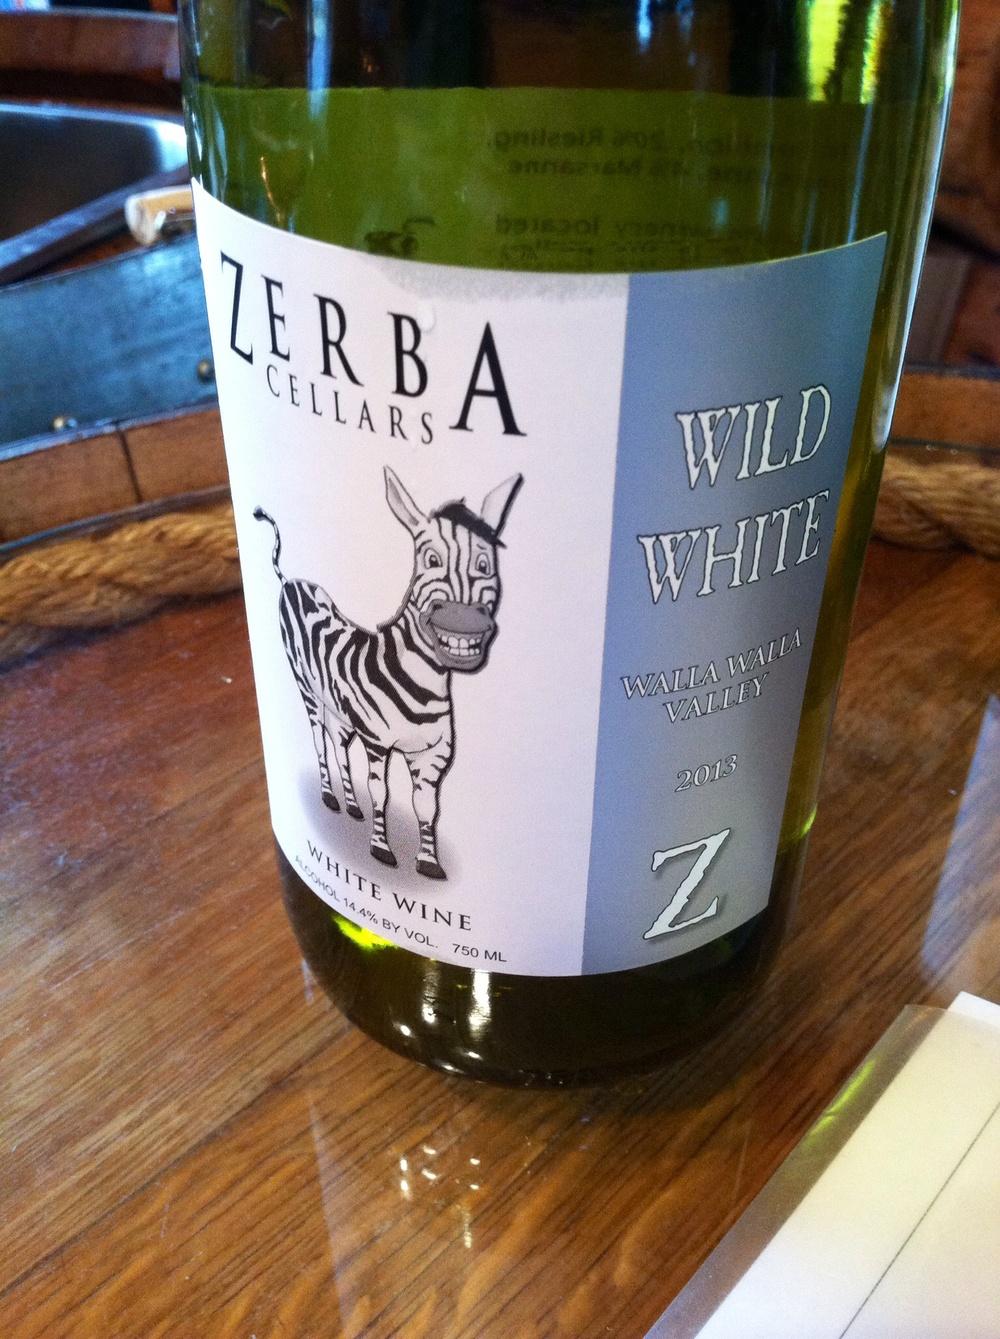 Zerba Cellars Wild White. Photo by Shana Sokol, Shana Speaks Wine.